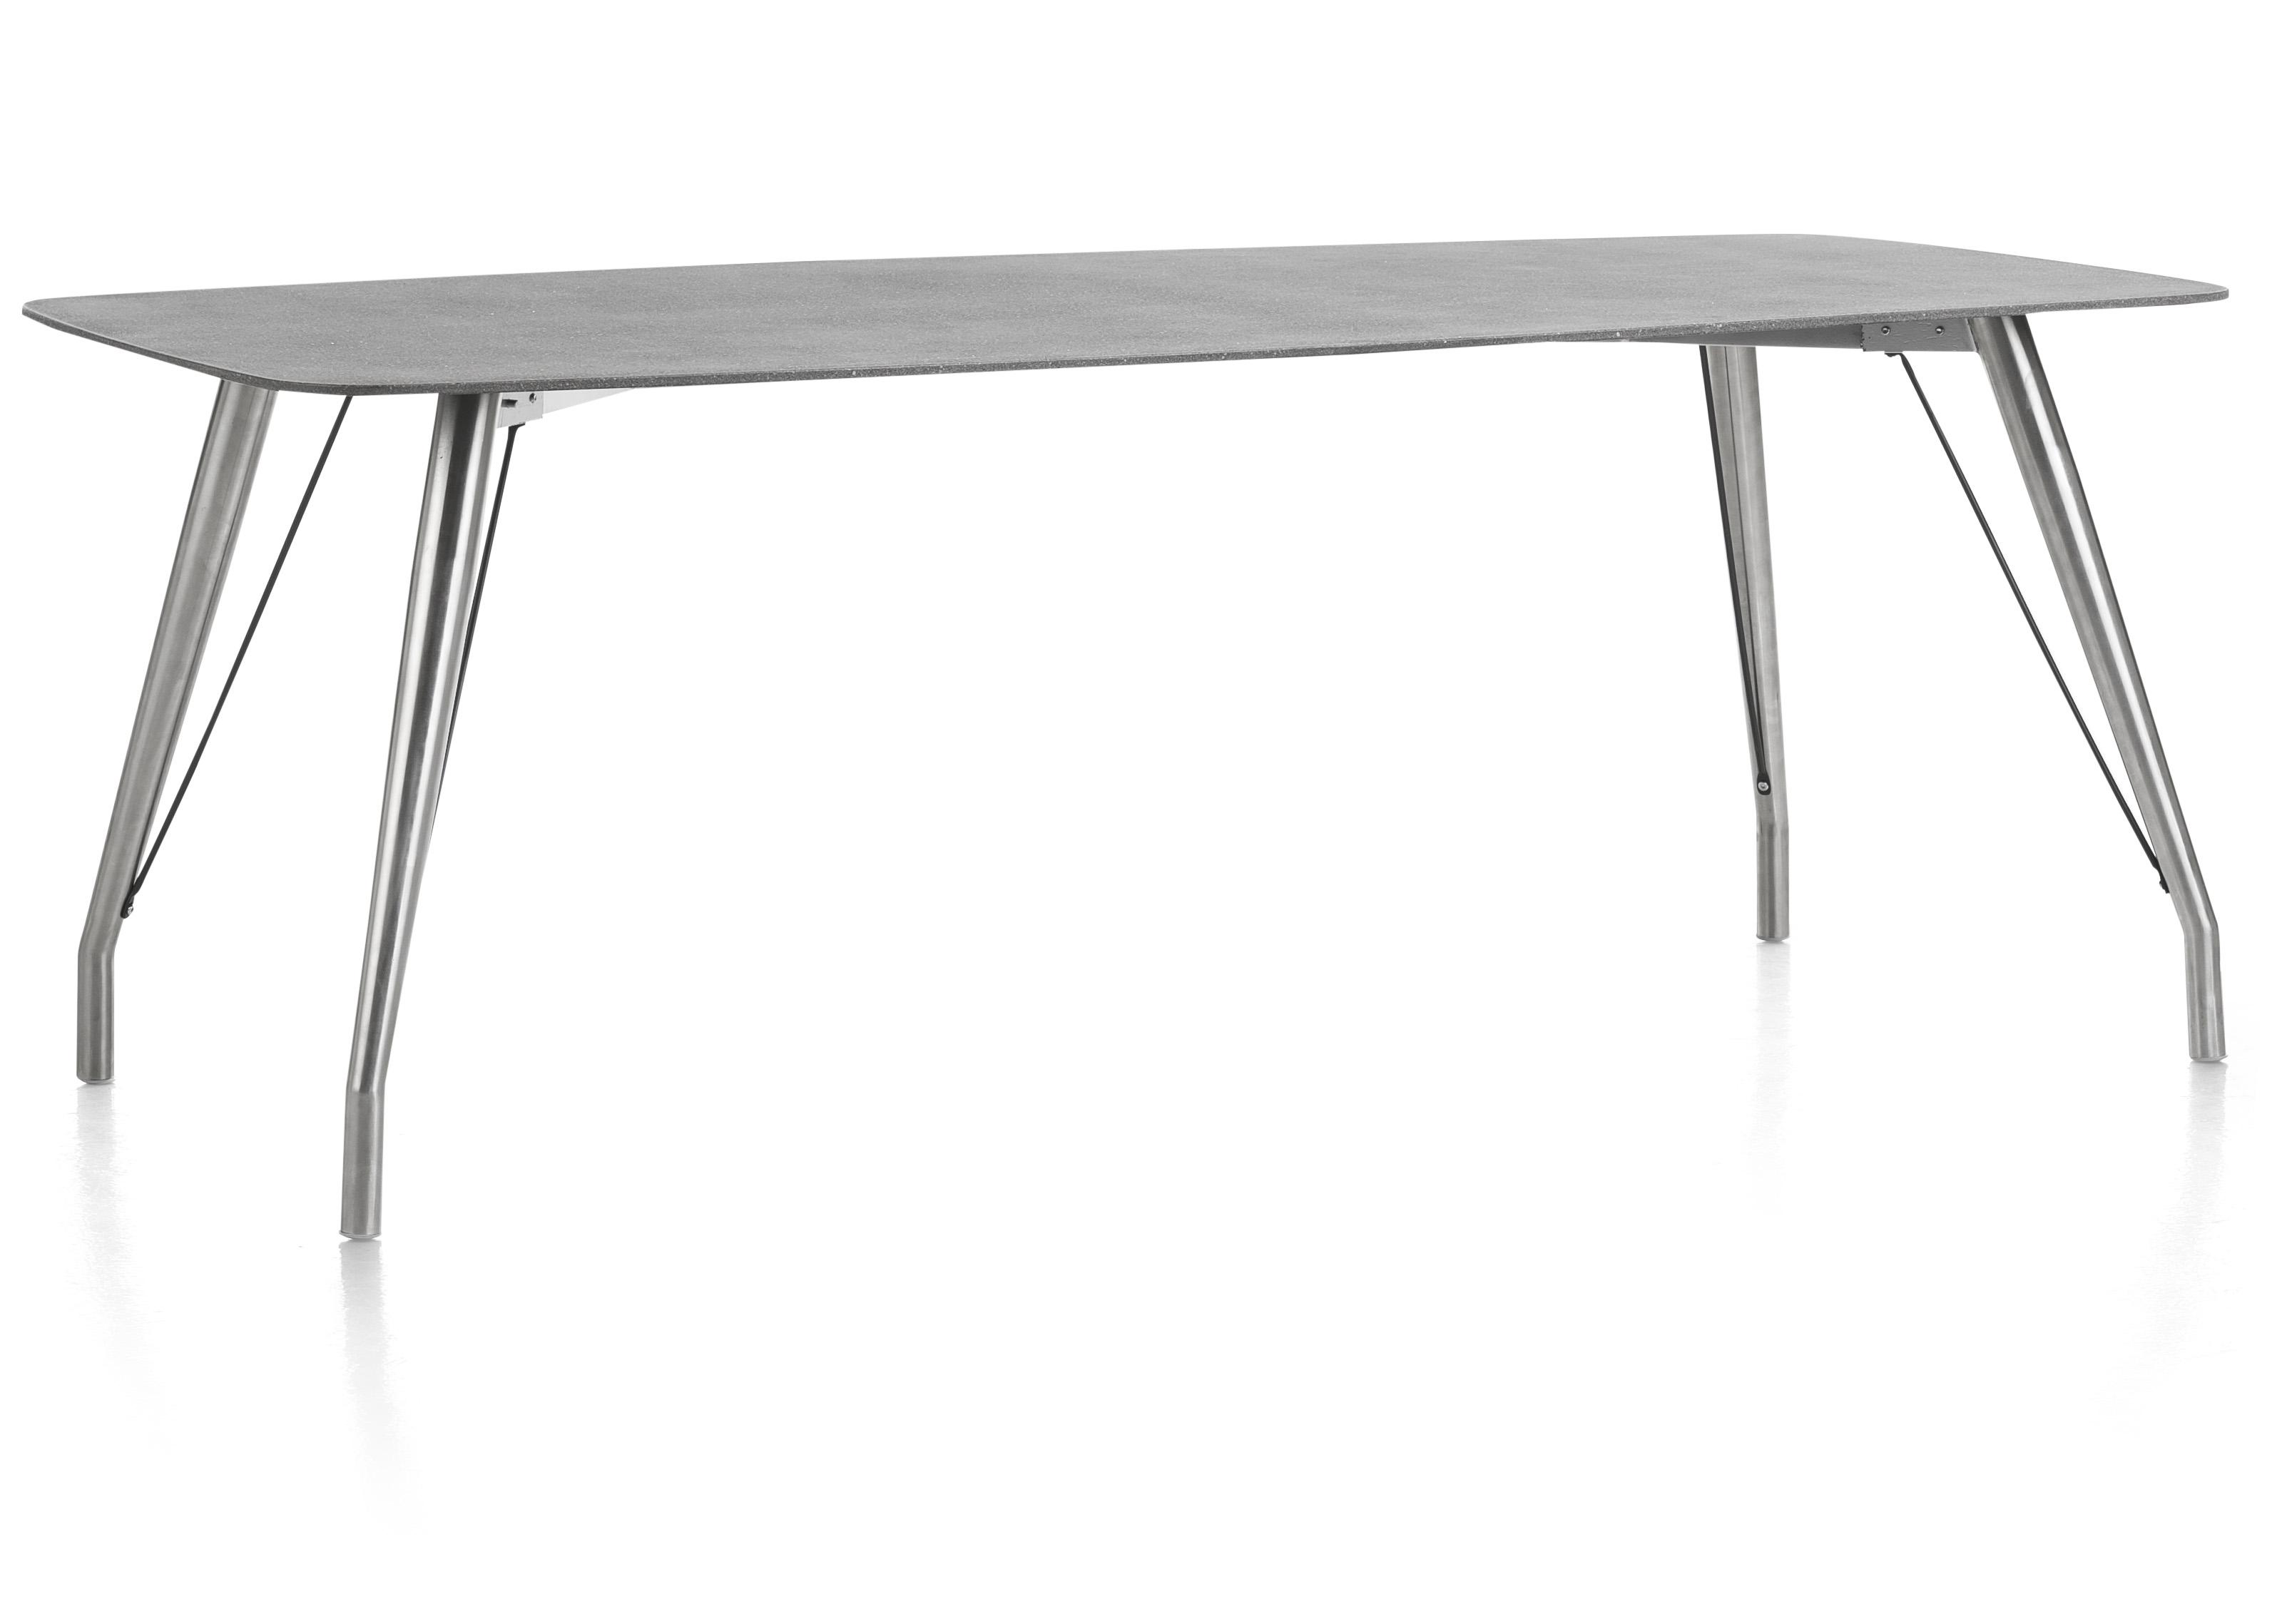 Table h01al meubelen joremeubelen jore for Destockage table a manger